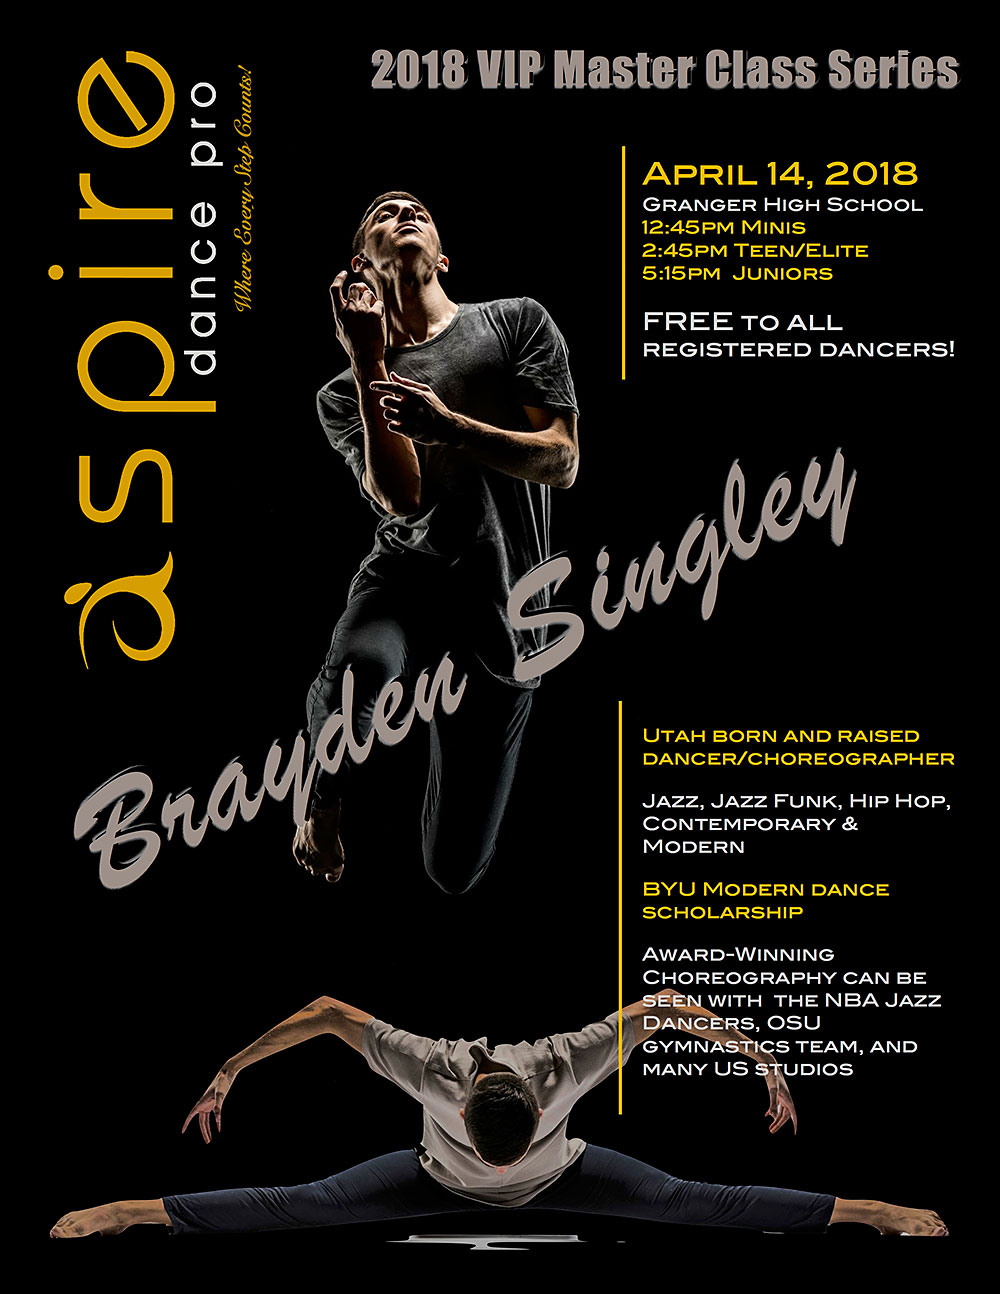 Brayden Singley - Aspire Dance Pro Competitions Masterclass Instructor